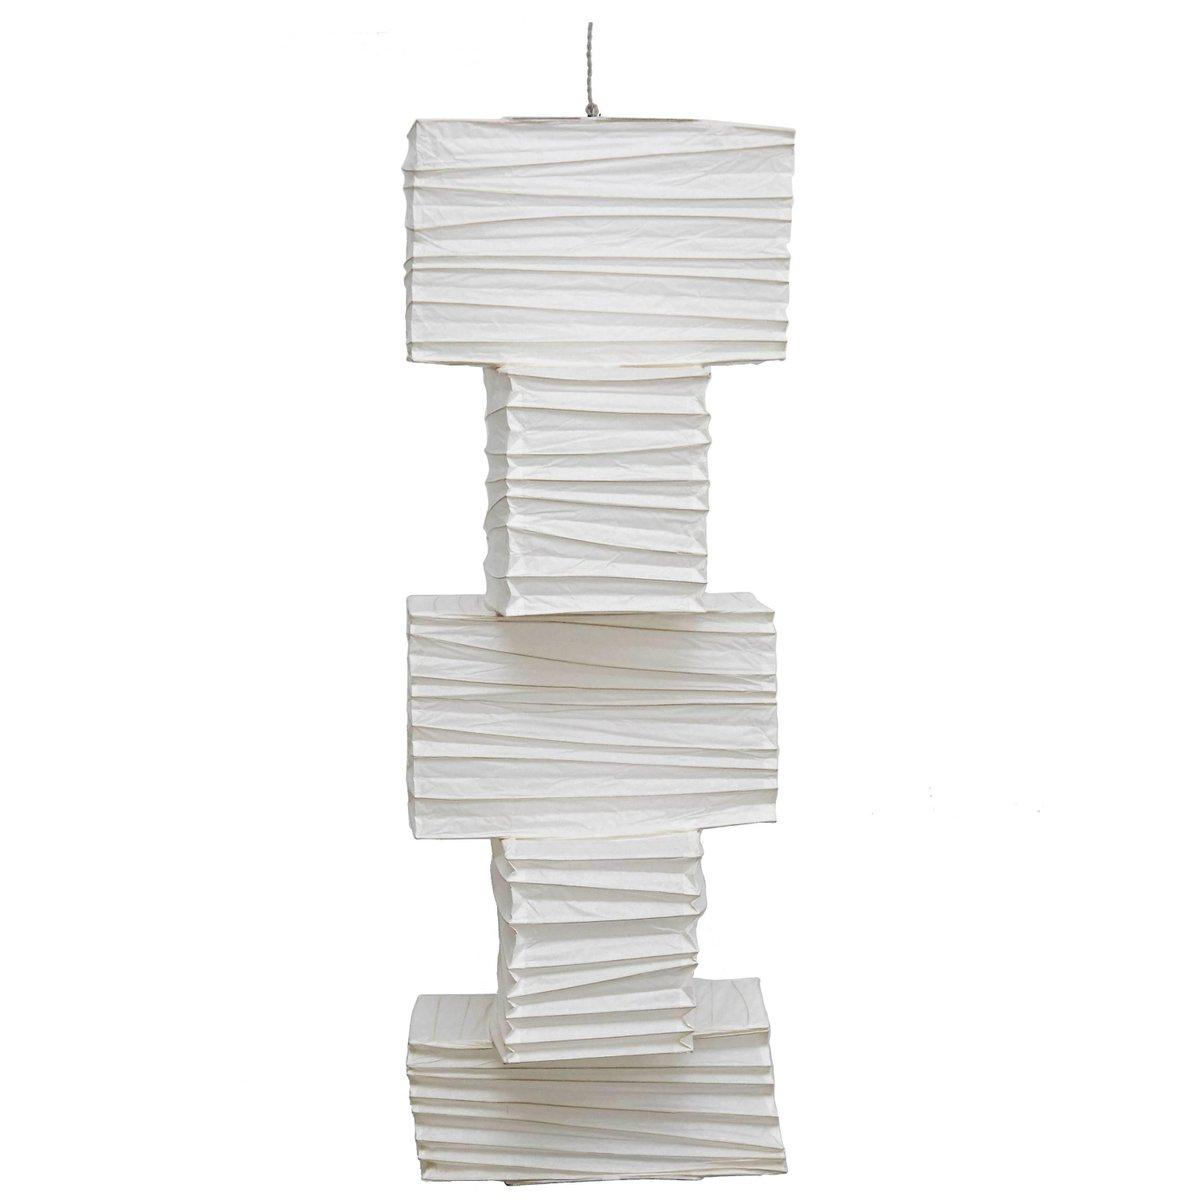 plafonnier en papier washi ondul tats unis 1950s en. Black Bedroom Furniture Sets. Home Design Ideas